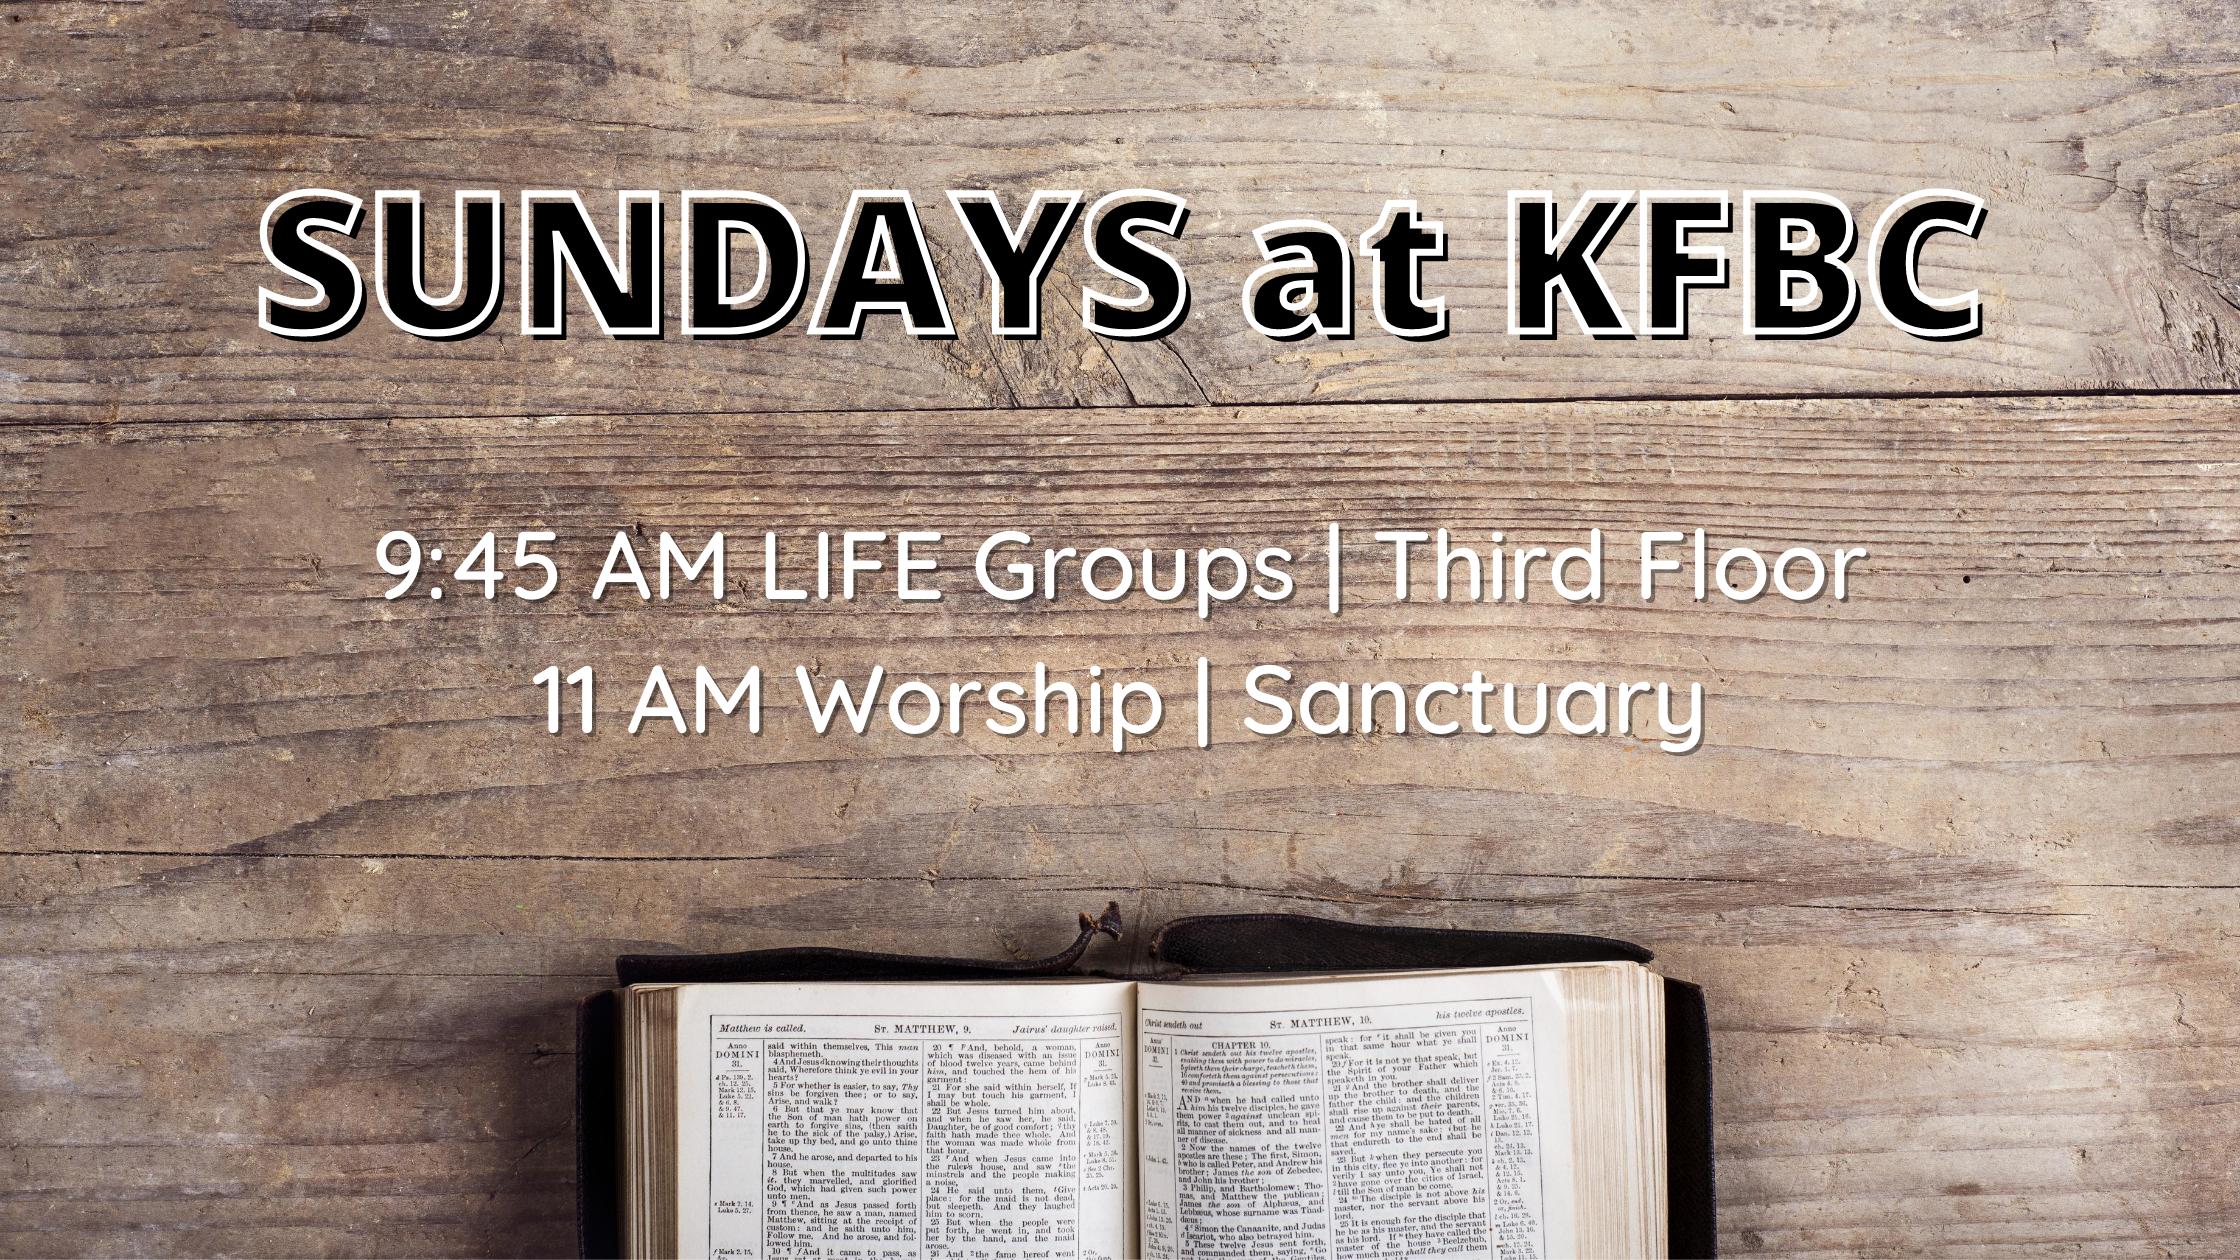 Sundays @ KFBC